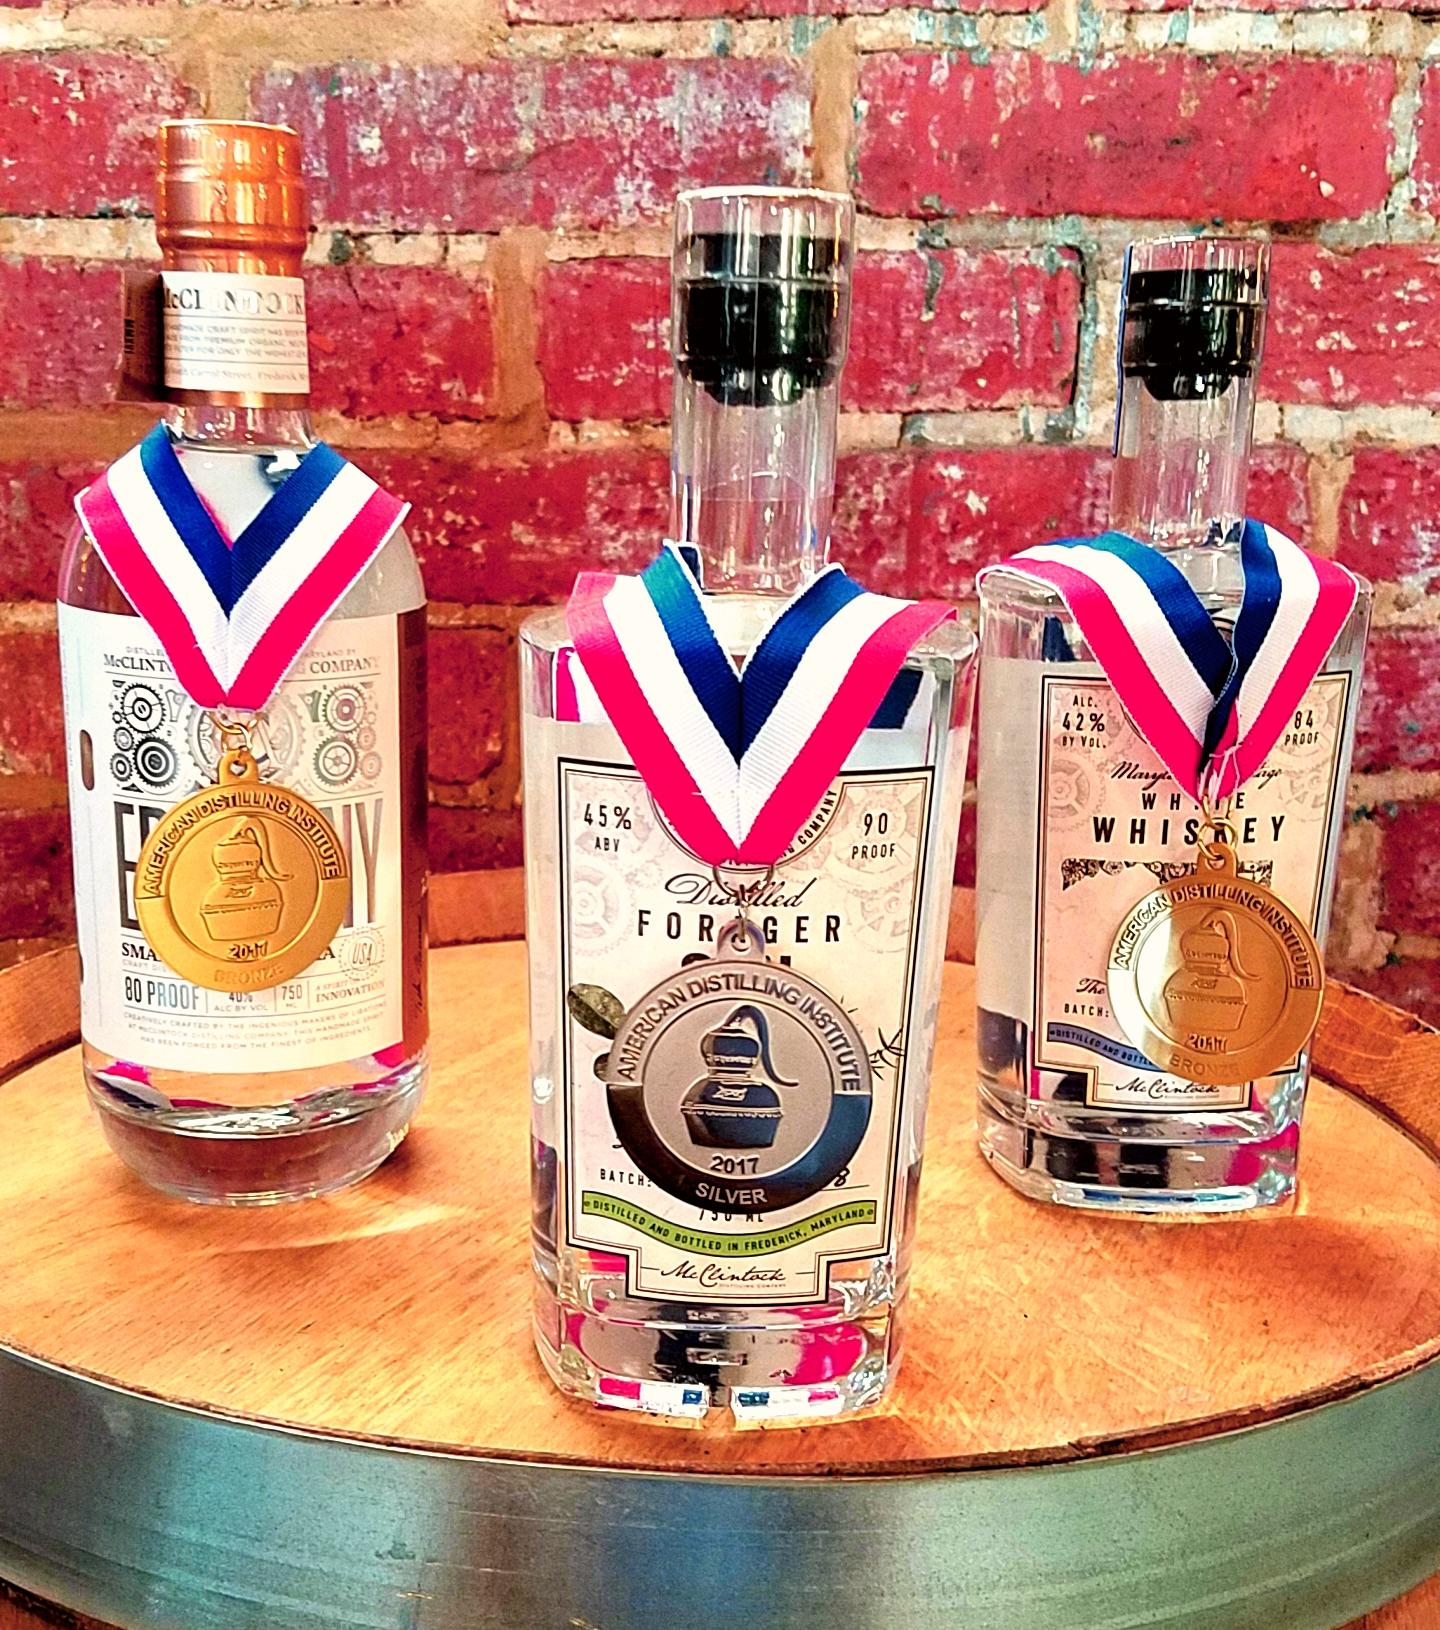 Our award winning spirits; Forager Gin, Epiphany Vodka and Maryland-Heritage White Whiskey.